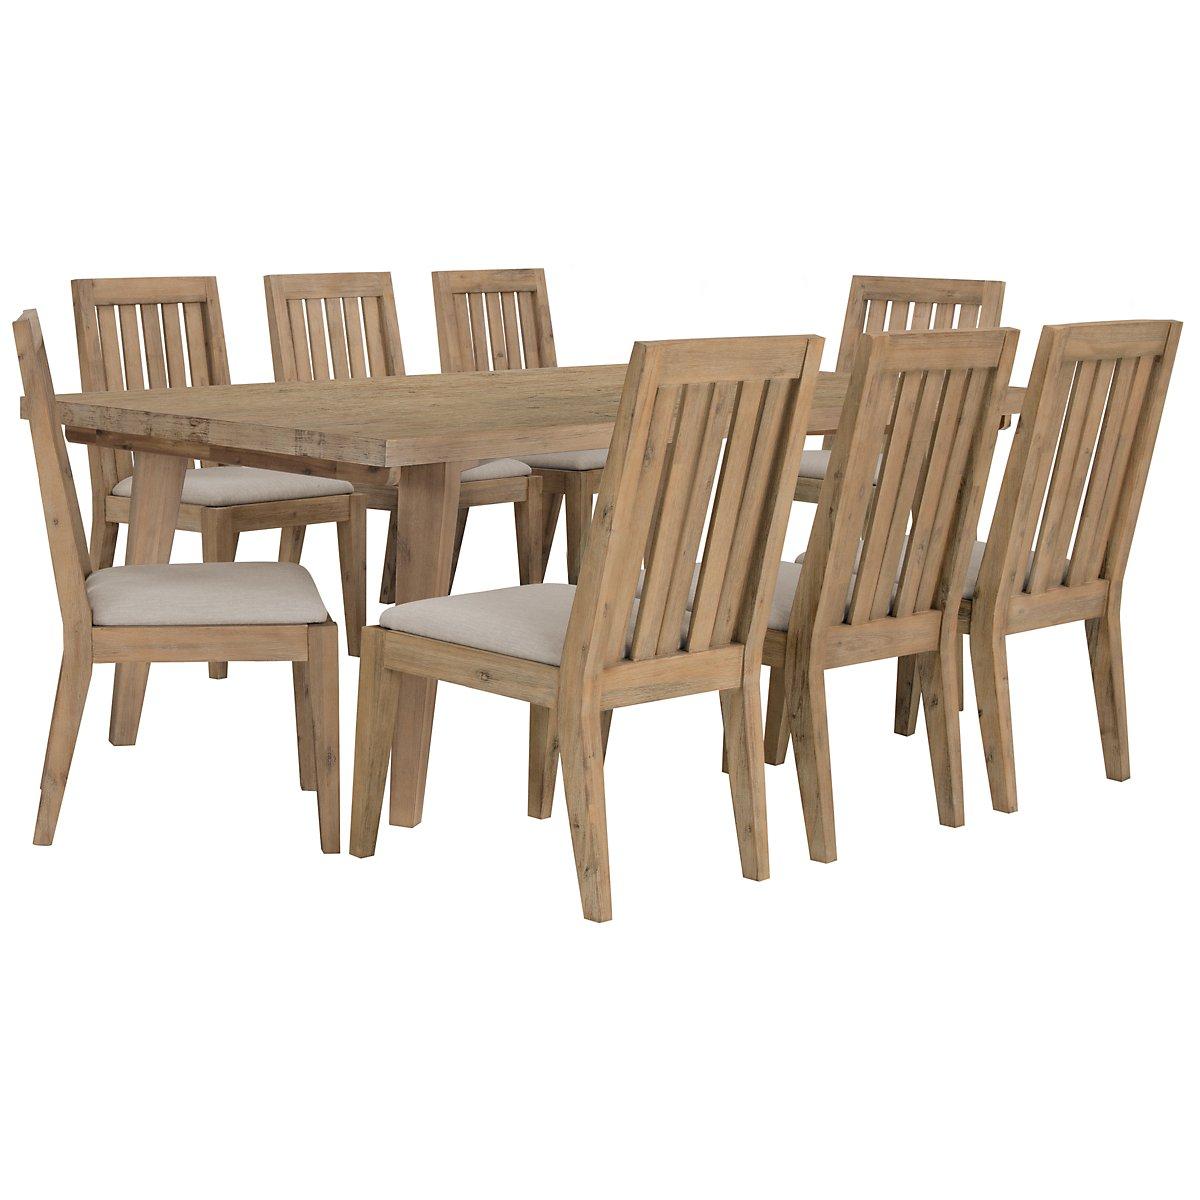 Casablanca Light Tone Rectangular Table & 4 Wood Chairs